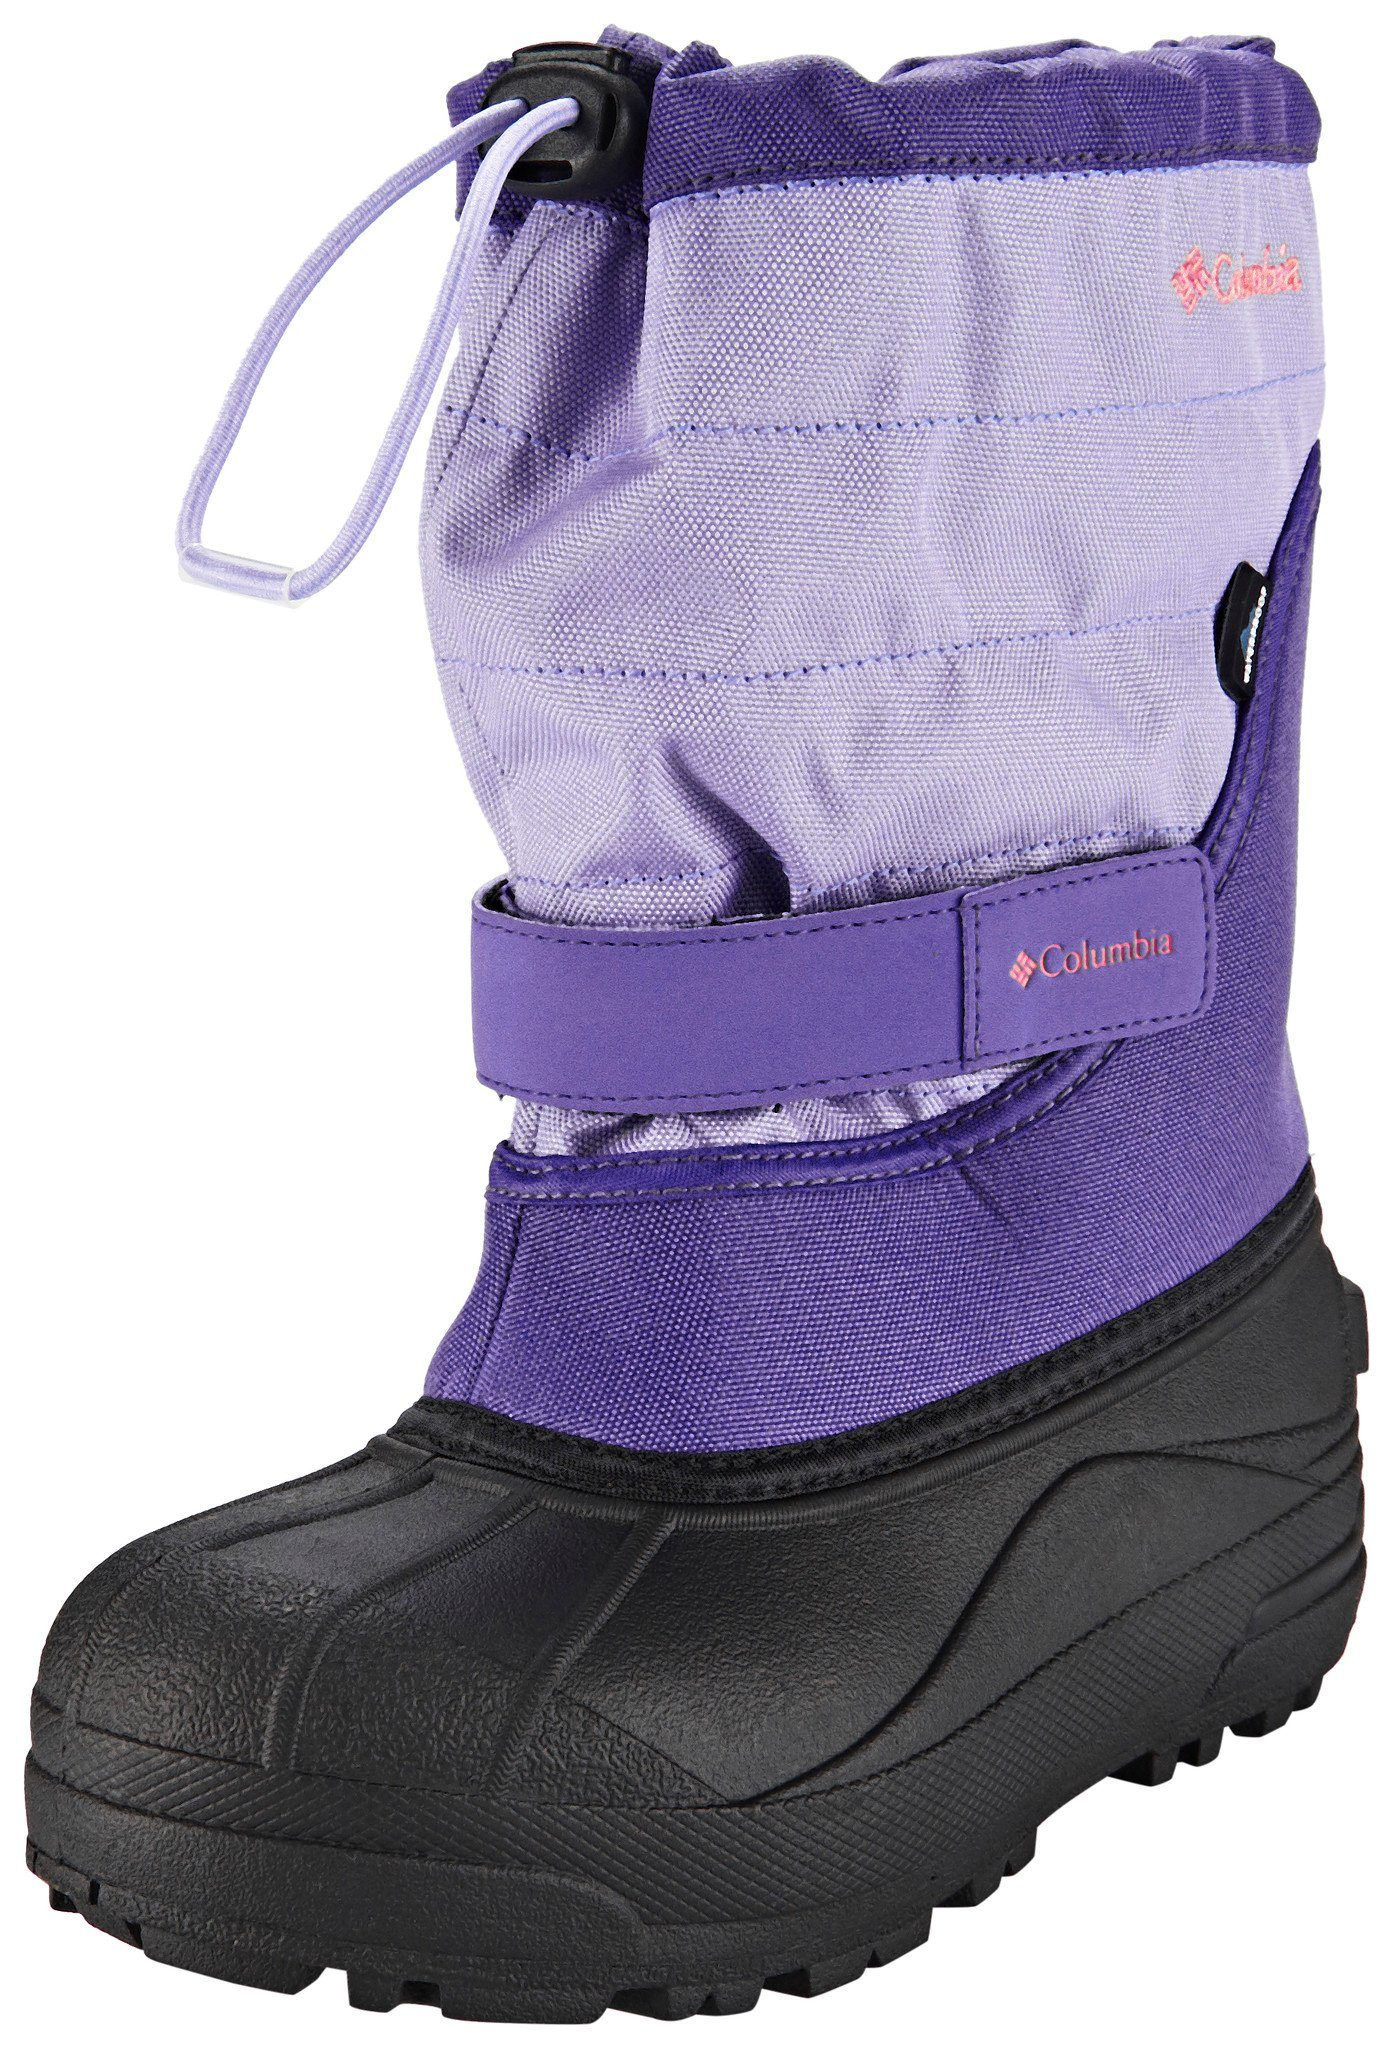 Columbia Stiefel »Powderbug Plus II Boots Youth«